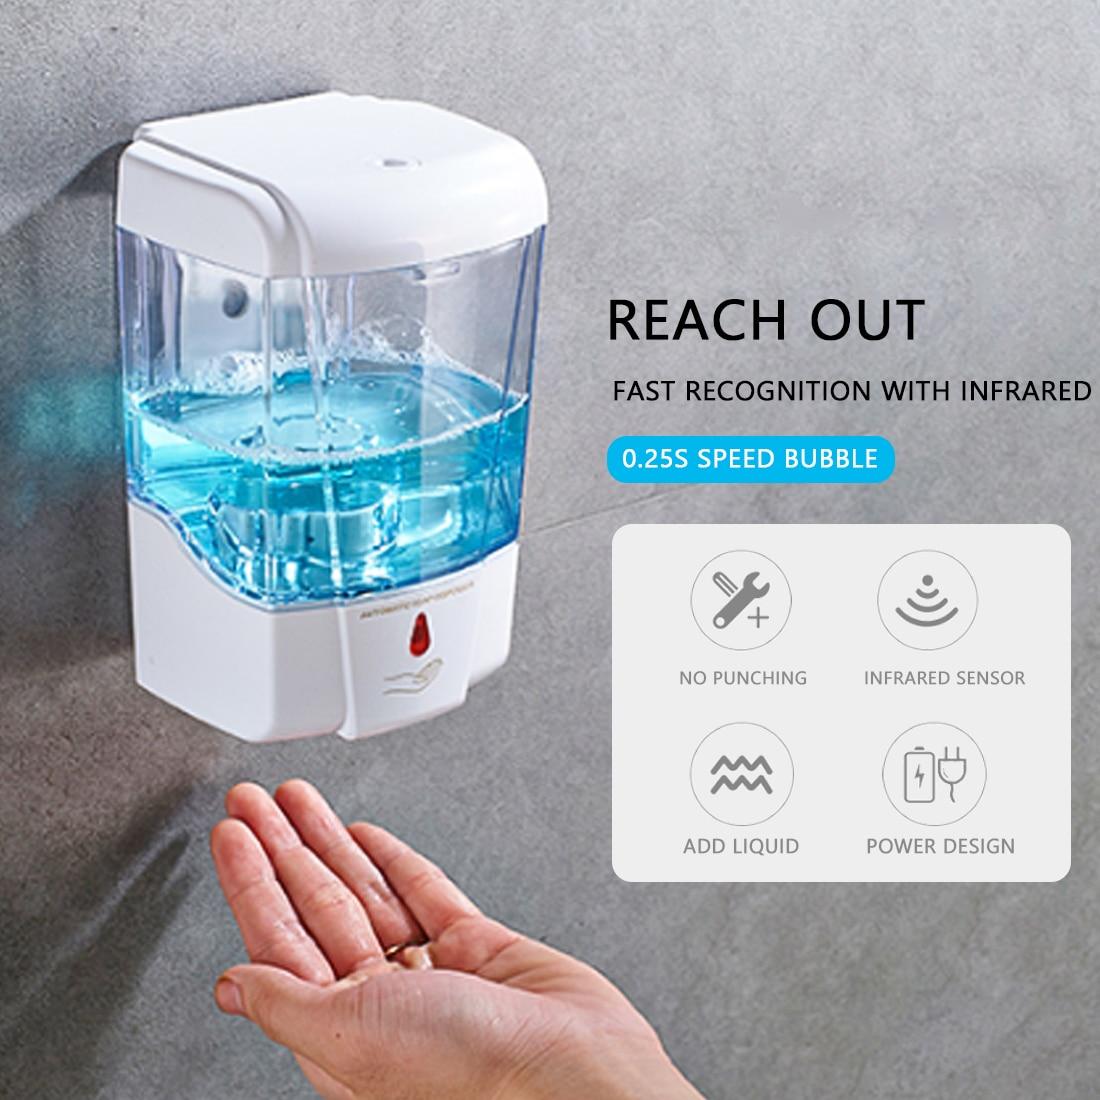 700ml Automatic Sensor Foam Soap Dispenser  Wall-Mount Soap Dispenser Touchless Soap Dispenser Battery Powered Kitchen Bathroom